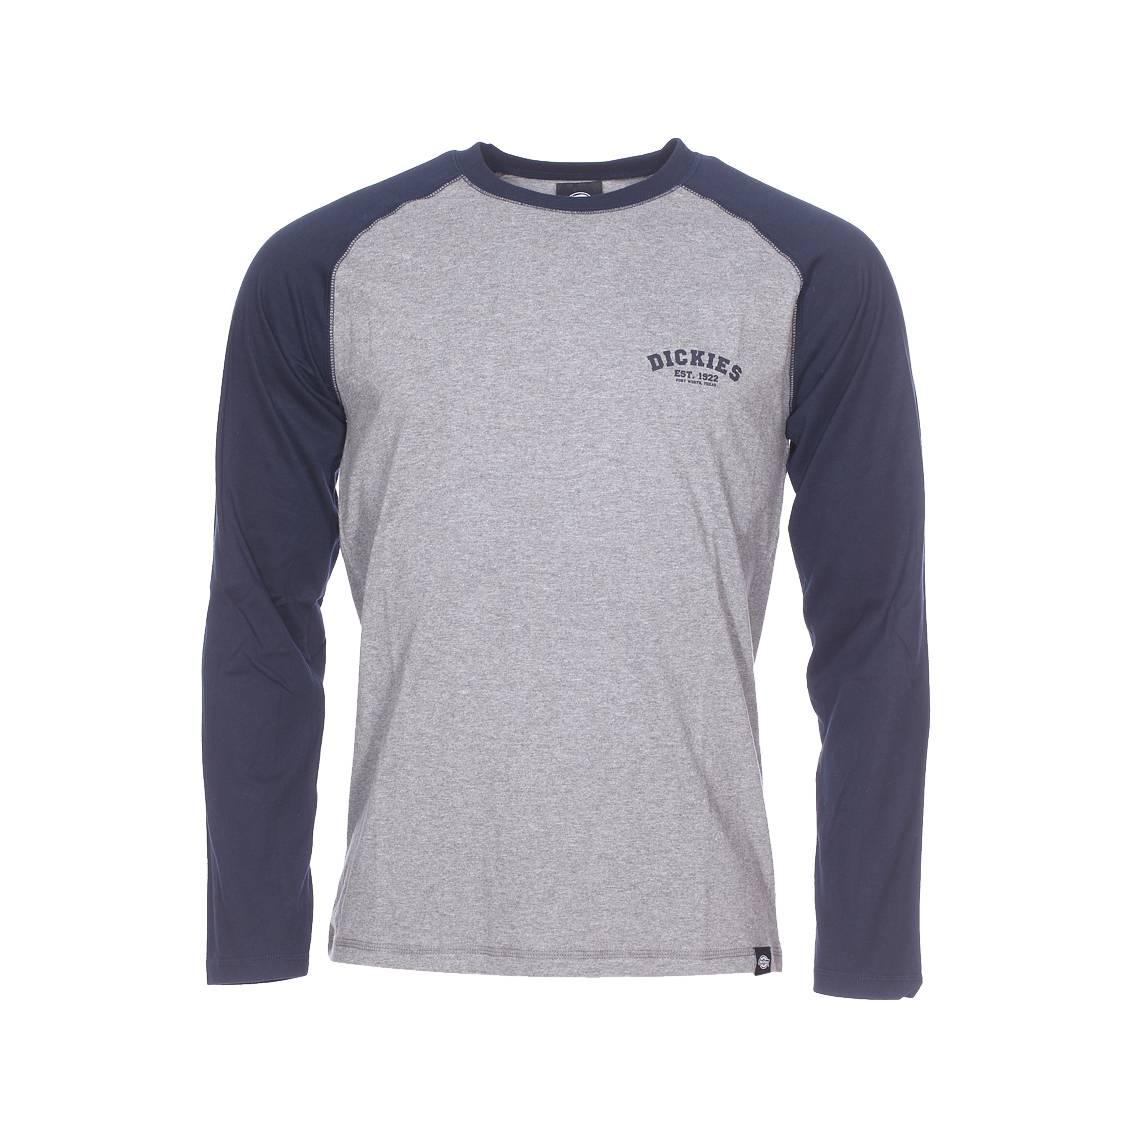 tee shirt manches longues dickies en coton gris chin et bleu marine rue des hommes. Black Bedroom Furniture Sets. Home Design Ideas